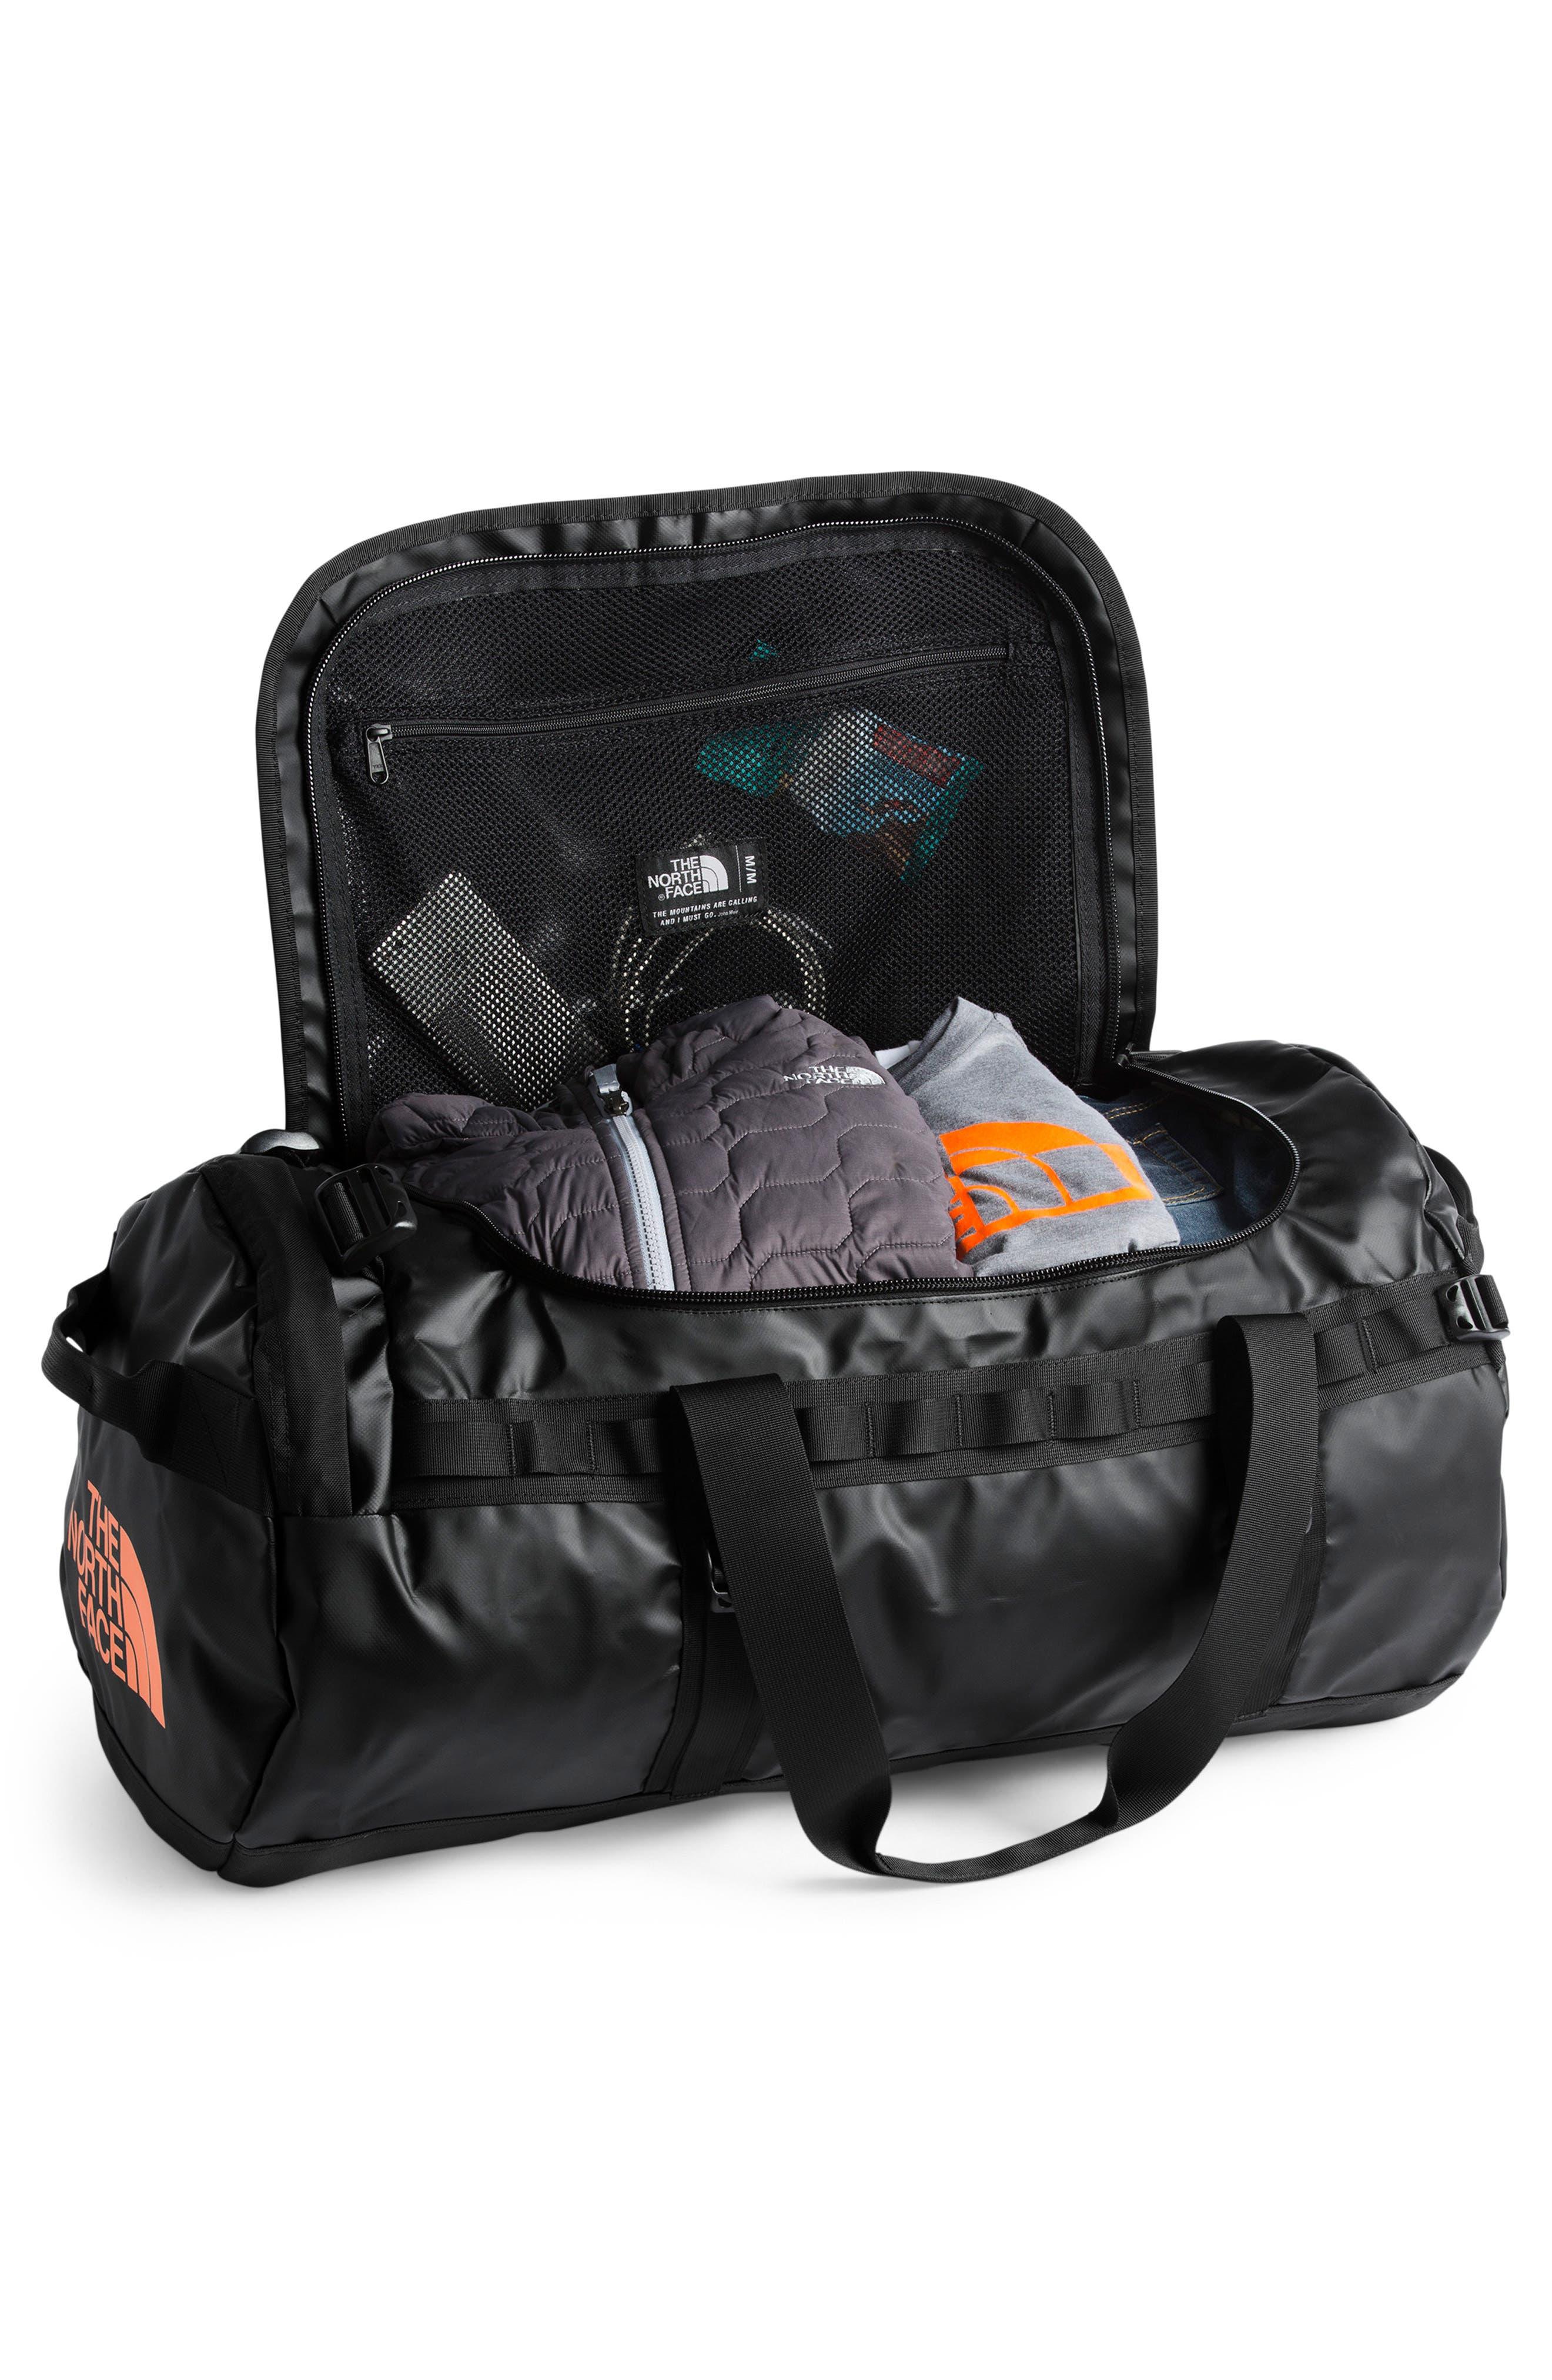 Base Camp Water Resistant Duffel Bag,                             Alternate thumbnail 2, color,                             TNF BLACK/ METALLIC COPPER